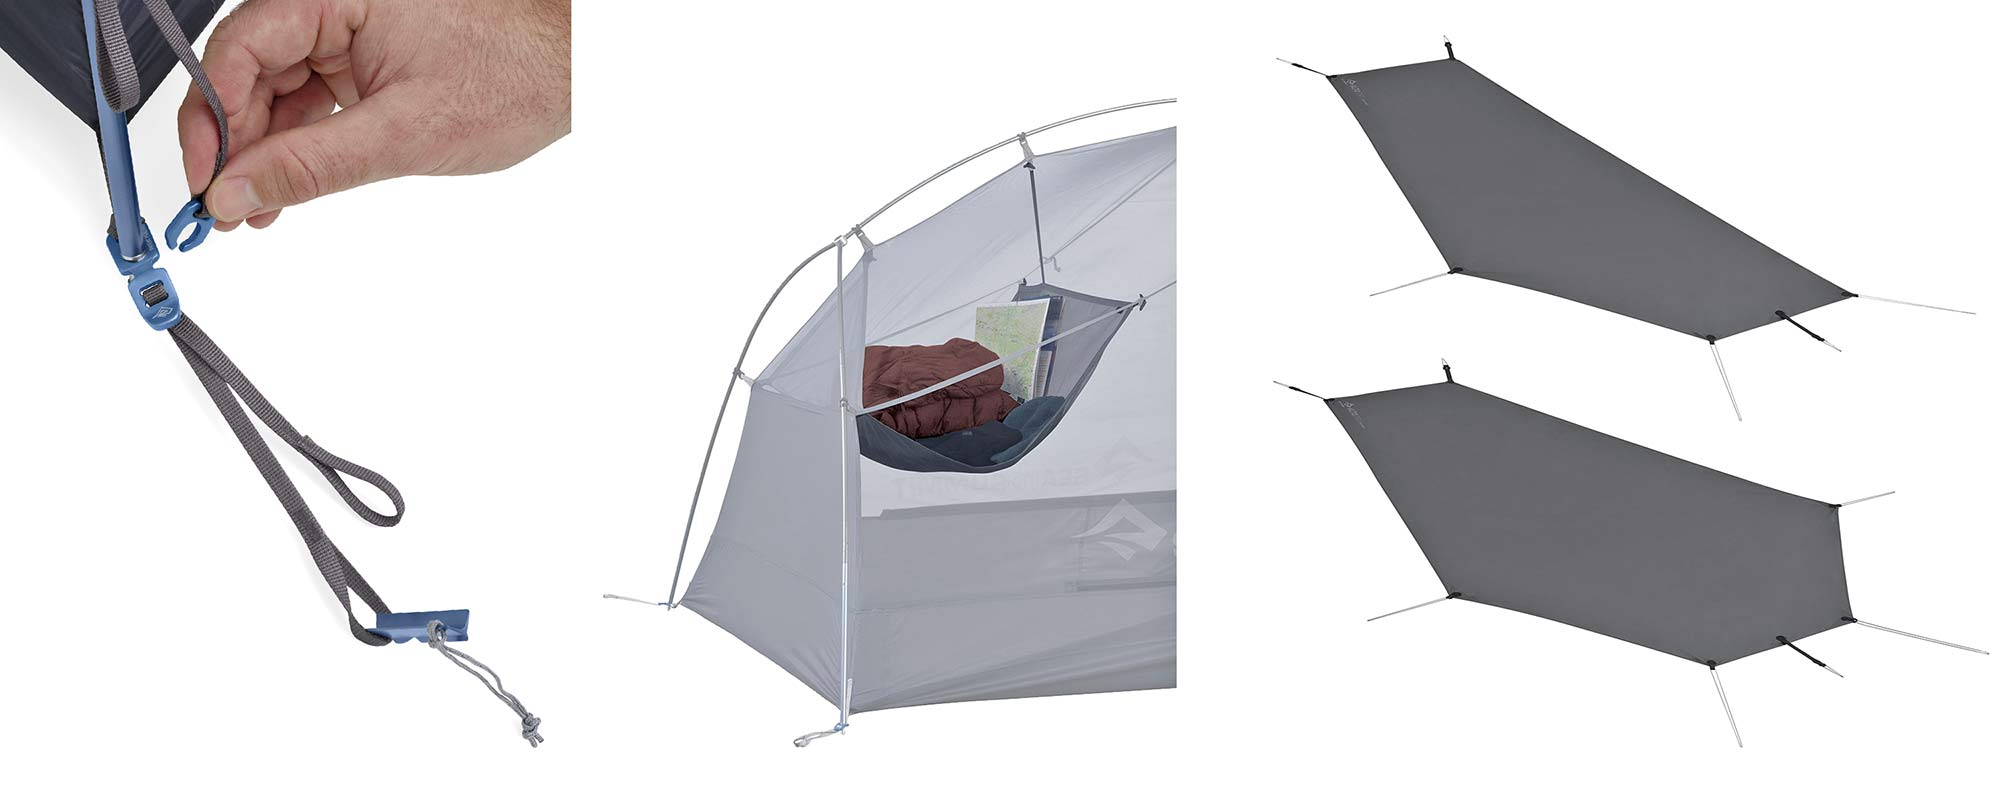 Sea to Summit Alto and Telos TR lightweight tents, Tension Ridge modular 3-season ultralight bikepacking tent,in the details